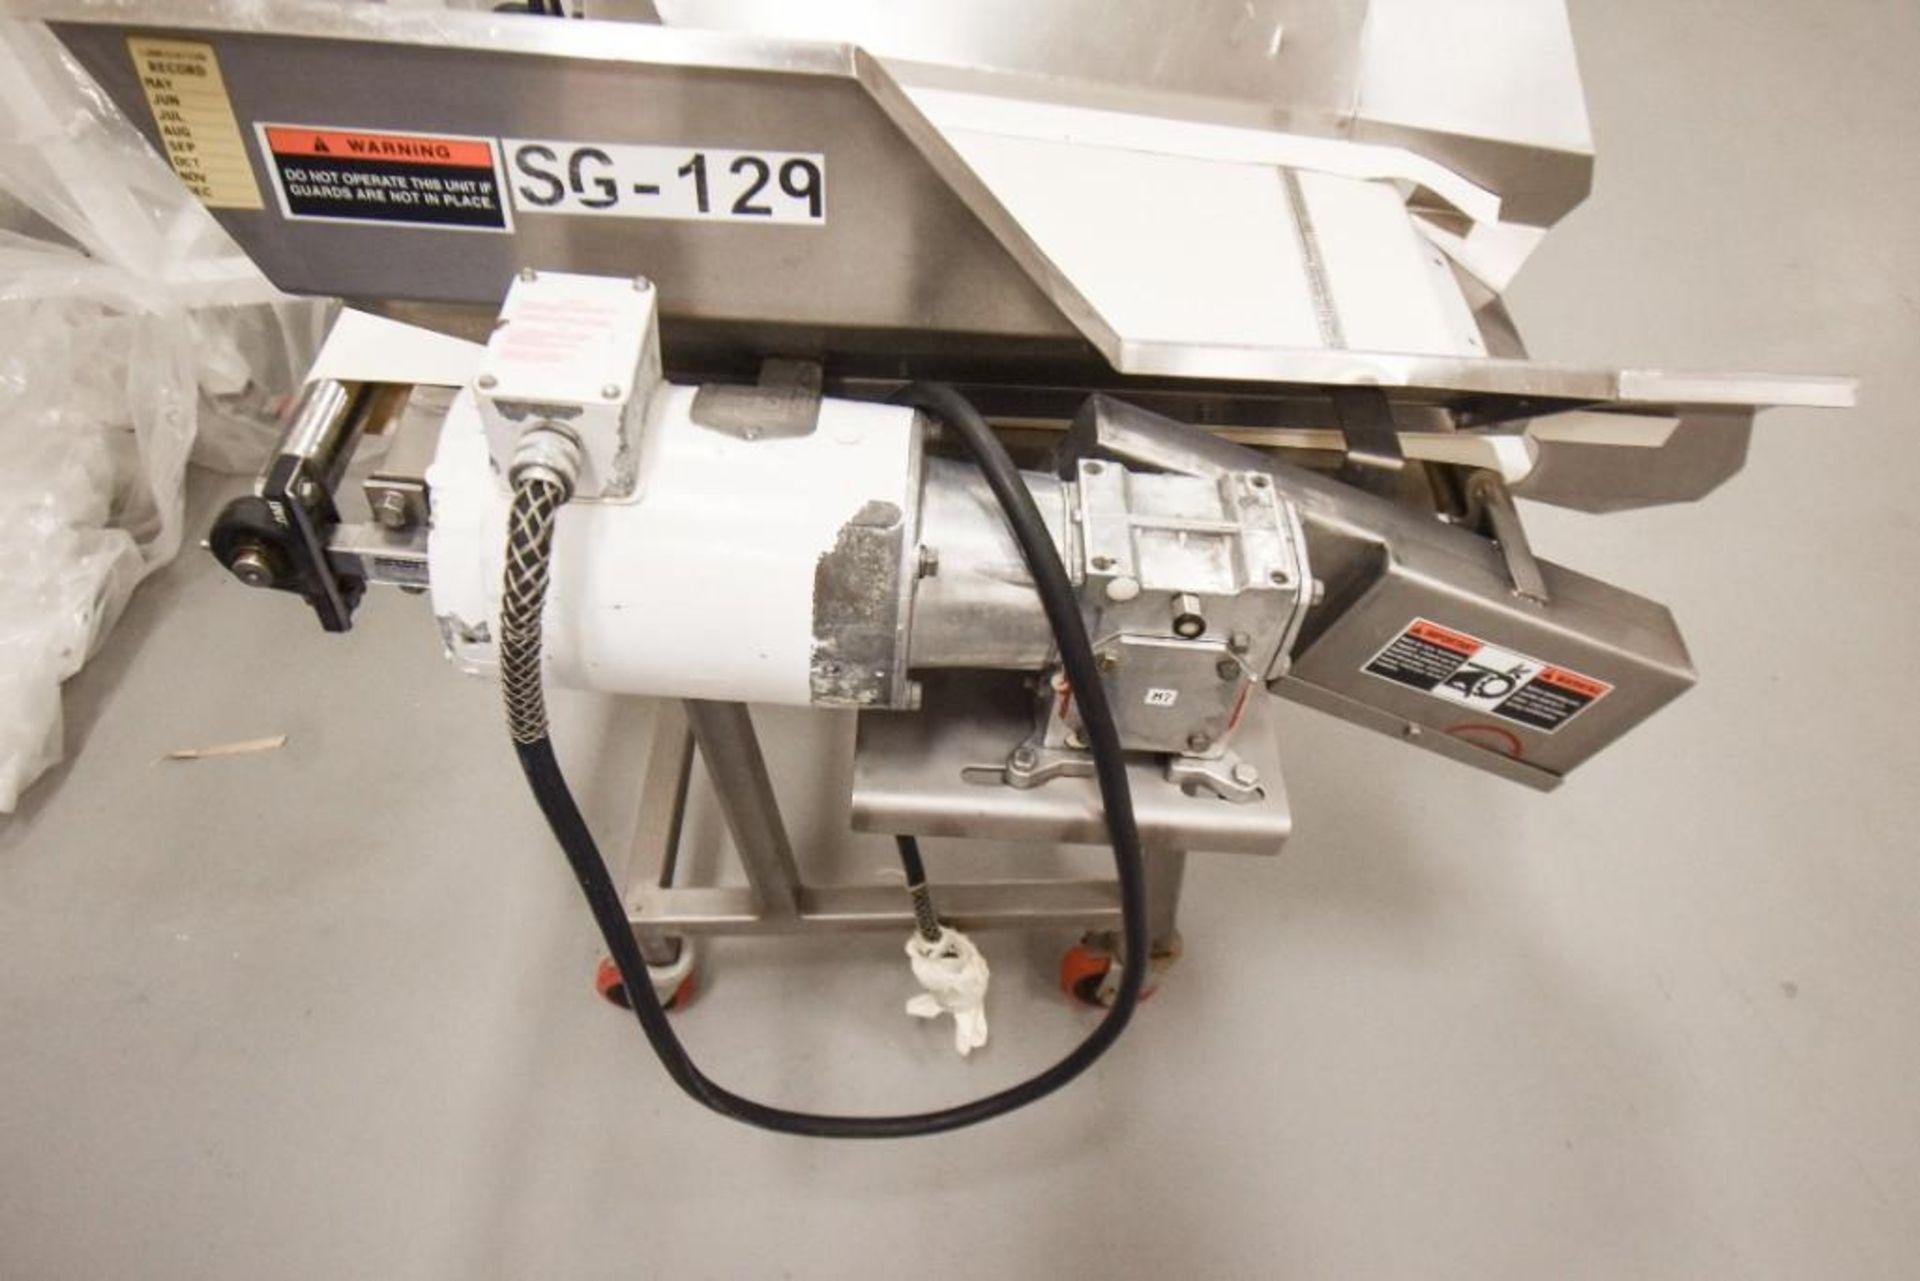 RBM Vibratory Deck With Food Grade Conveyor TS-B 24X3-0 - Image 3 of 7